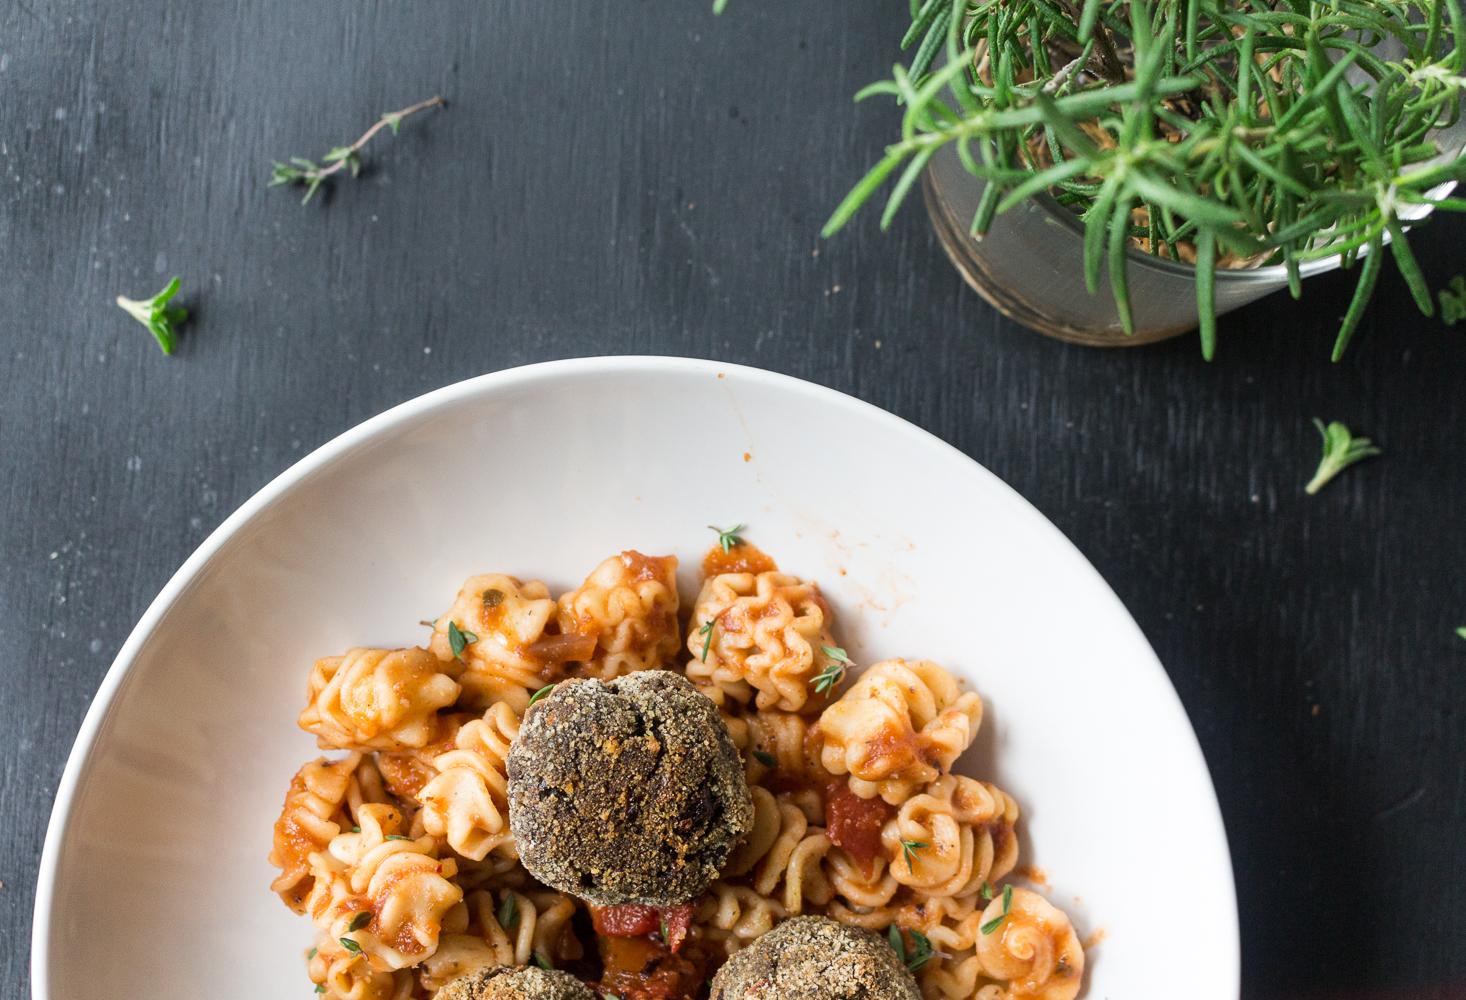 All of It - Vegan Lentil Mushroom Meatballs